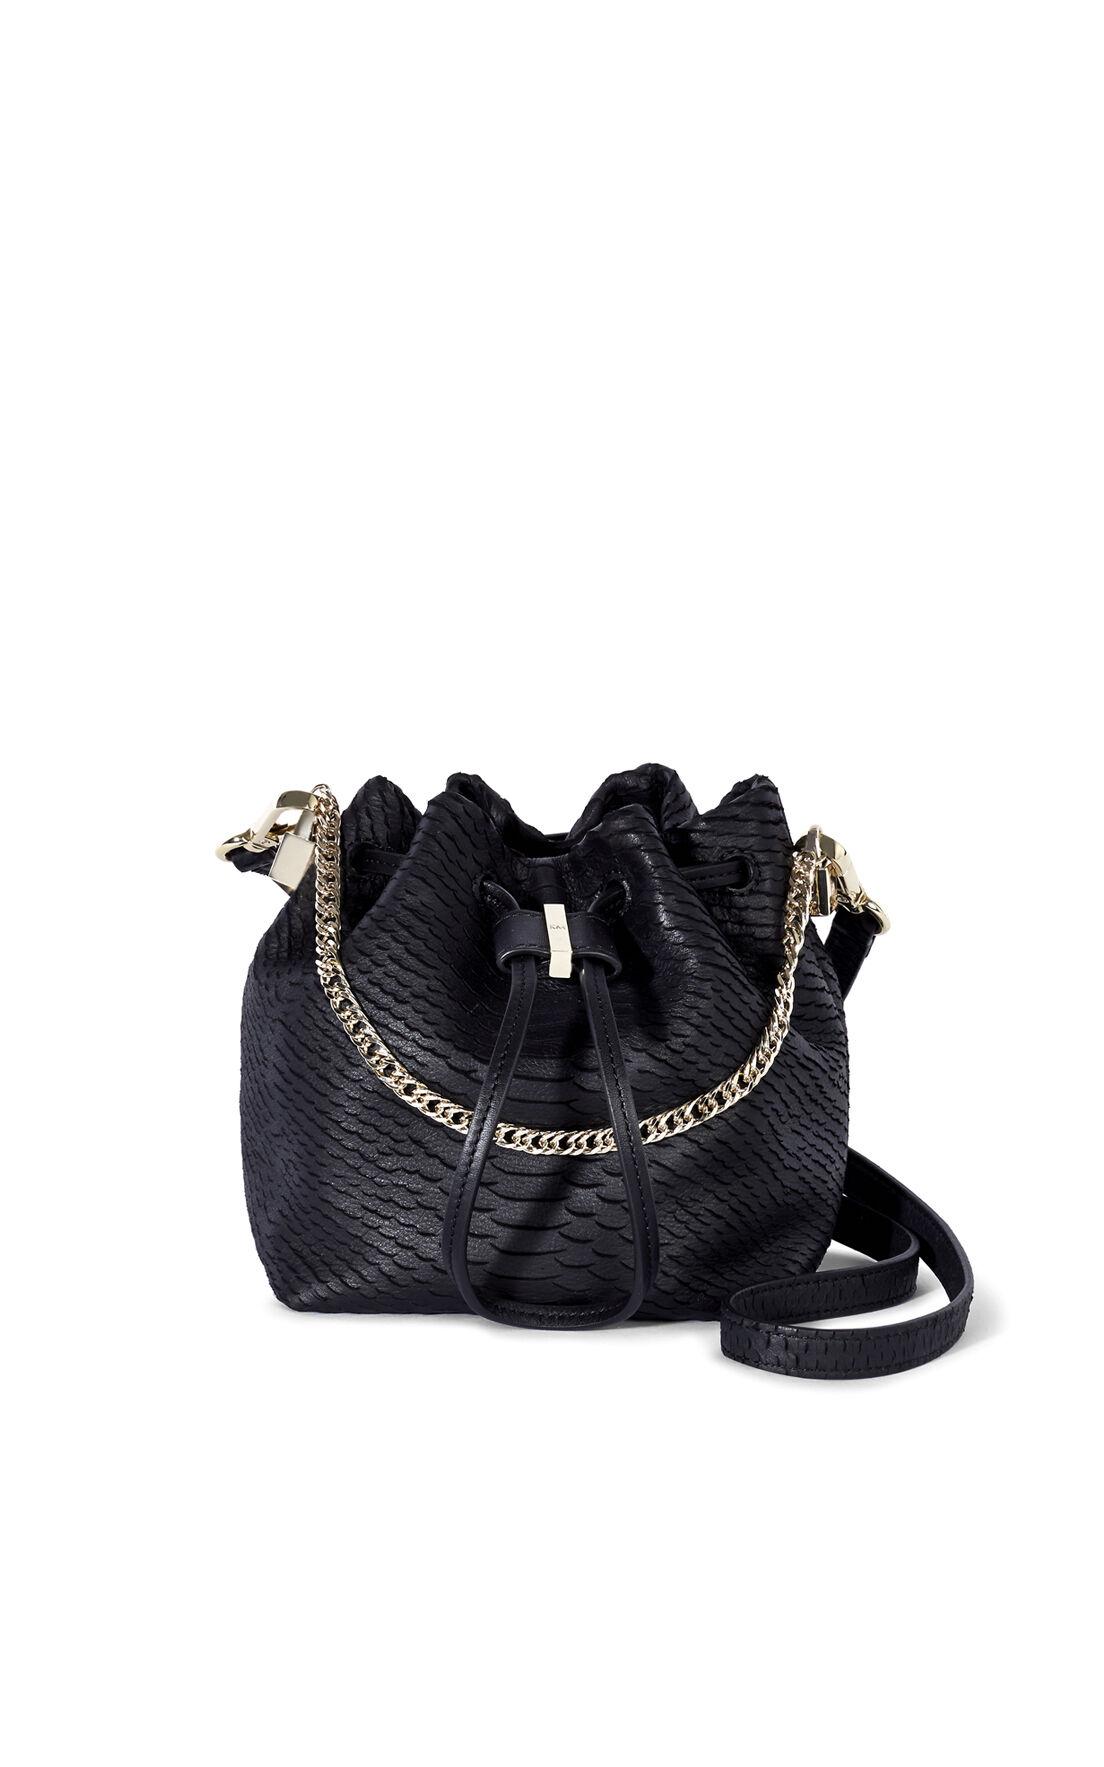 Karen Millen, SNAKE MINI BUCKET BAG Black 0